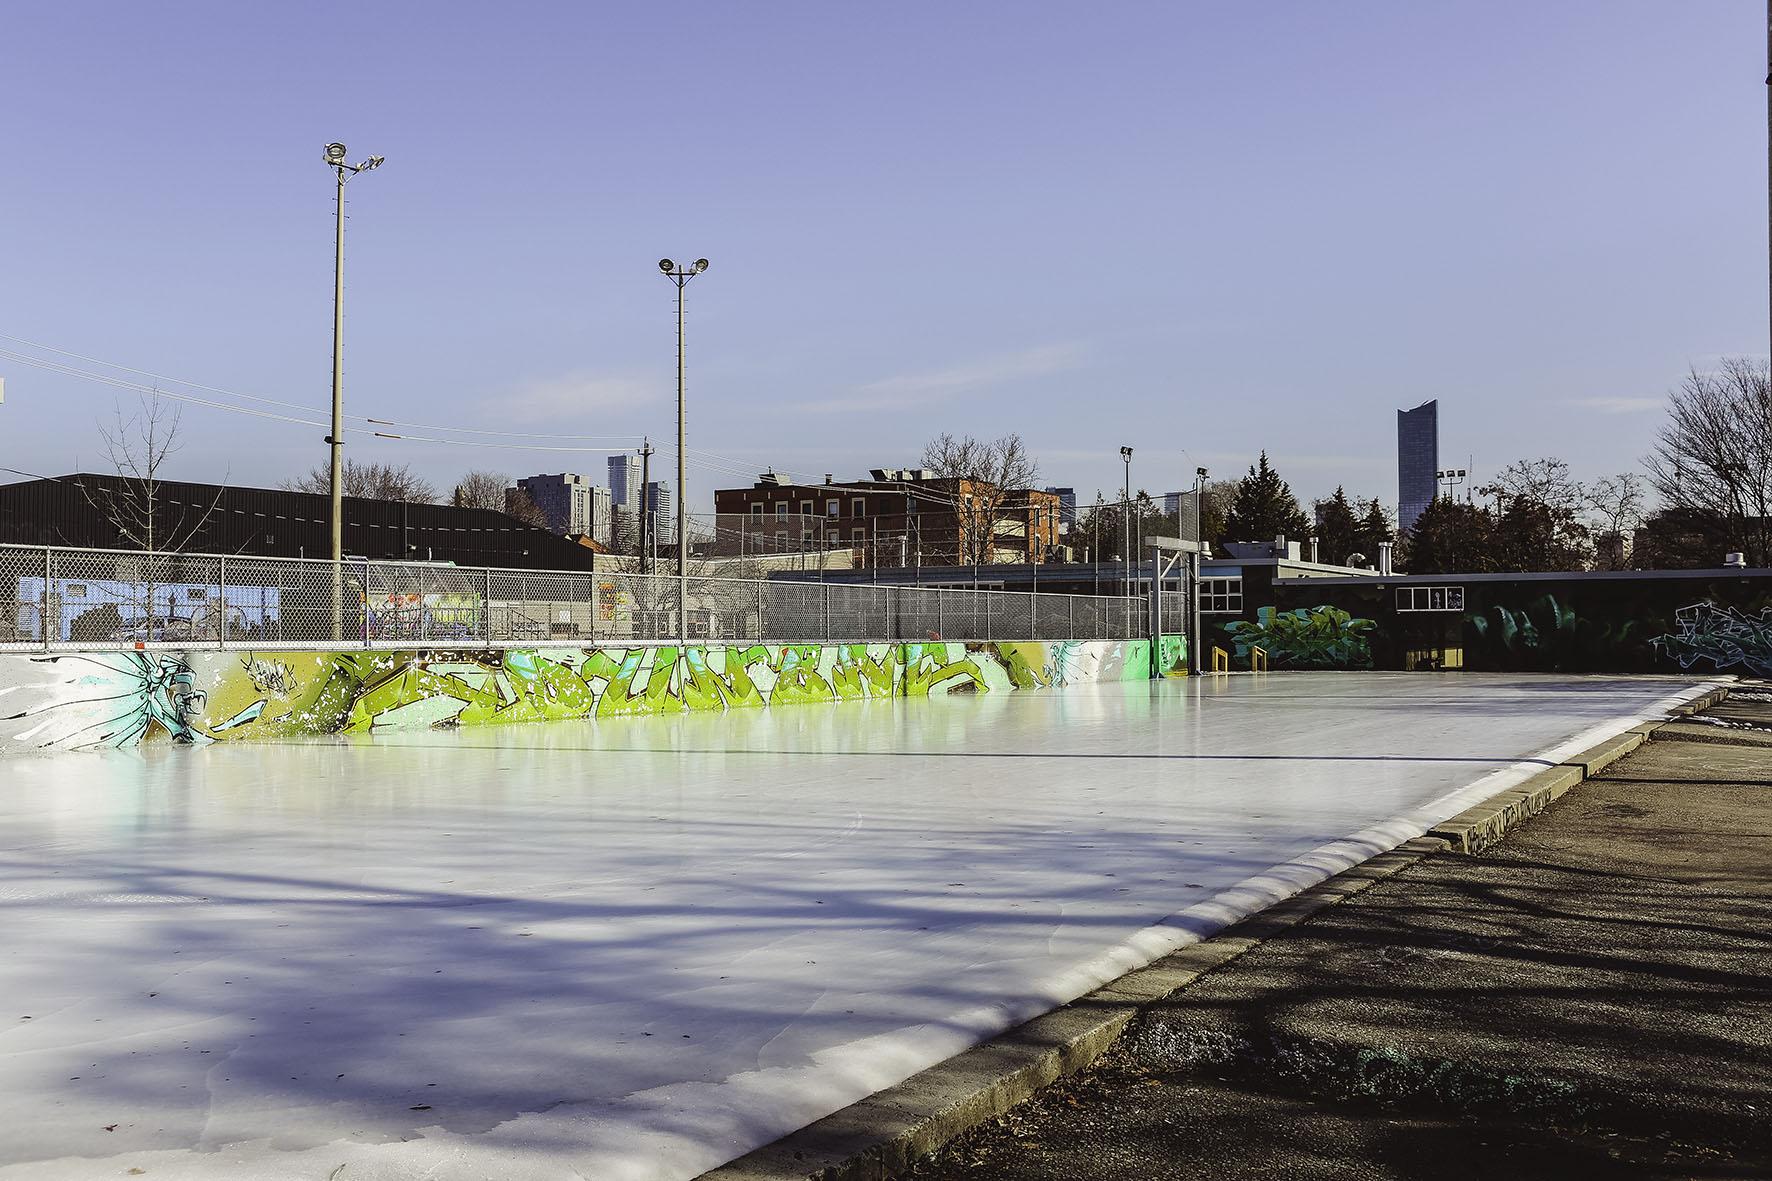 ice rink 2.jpg